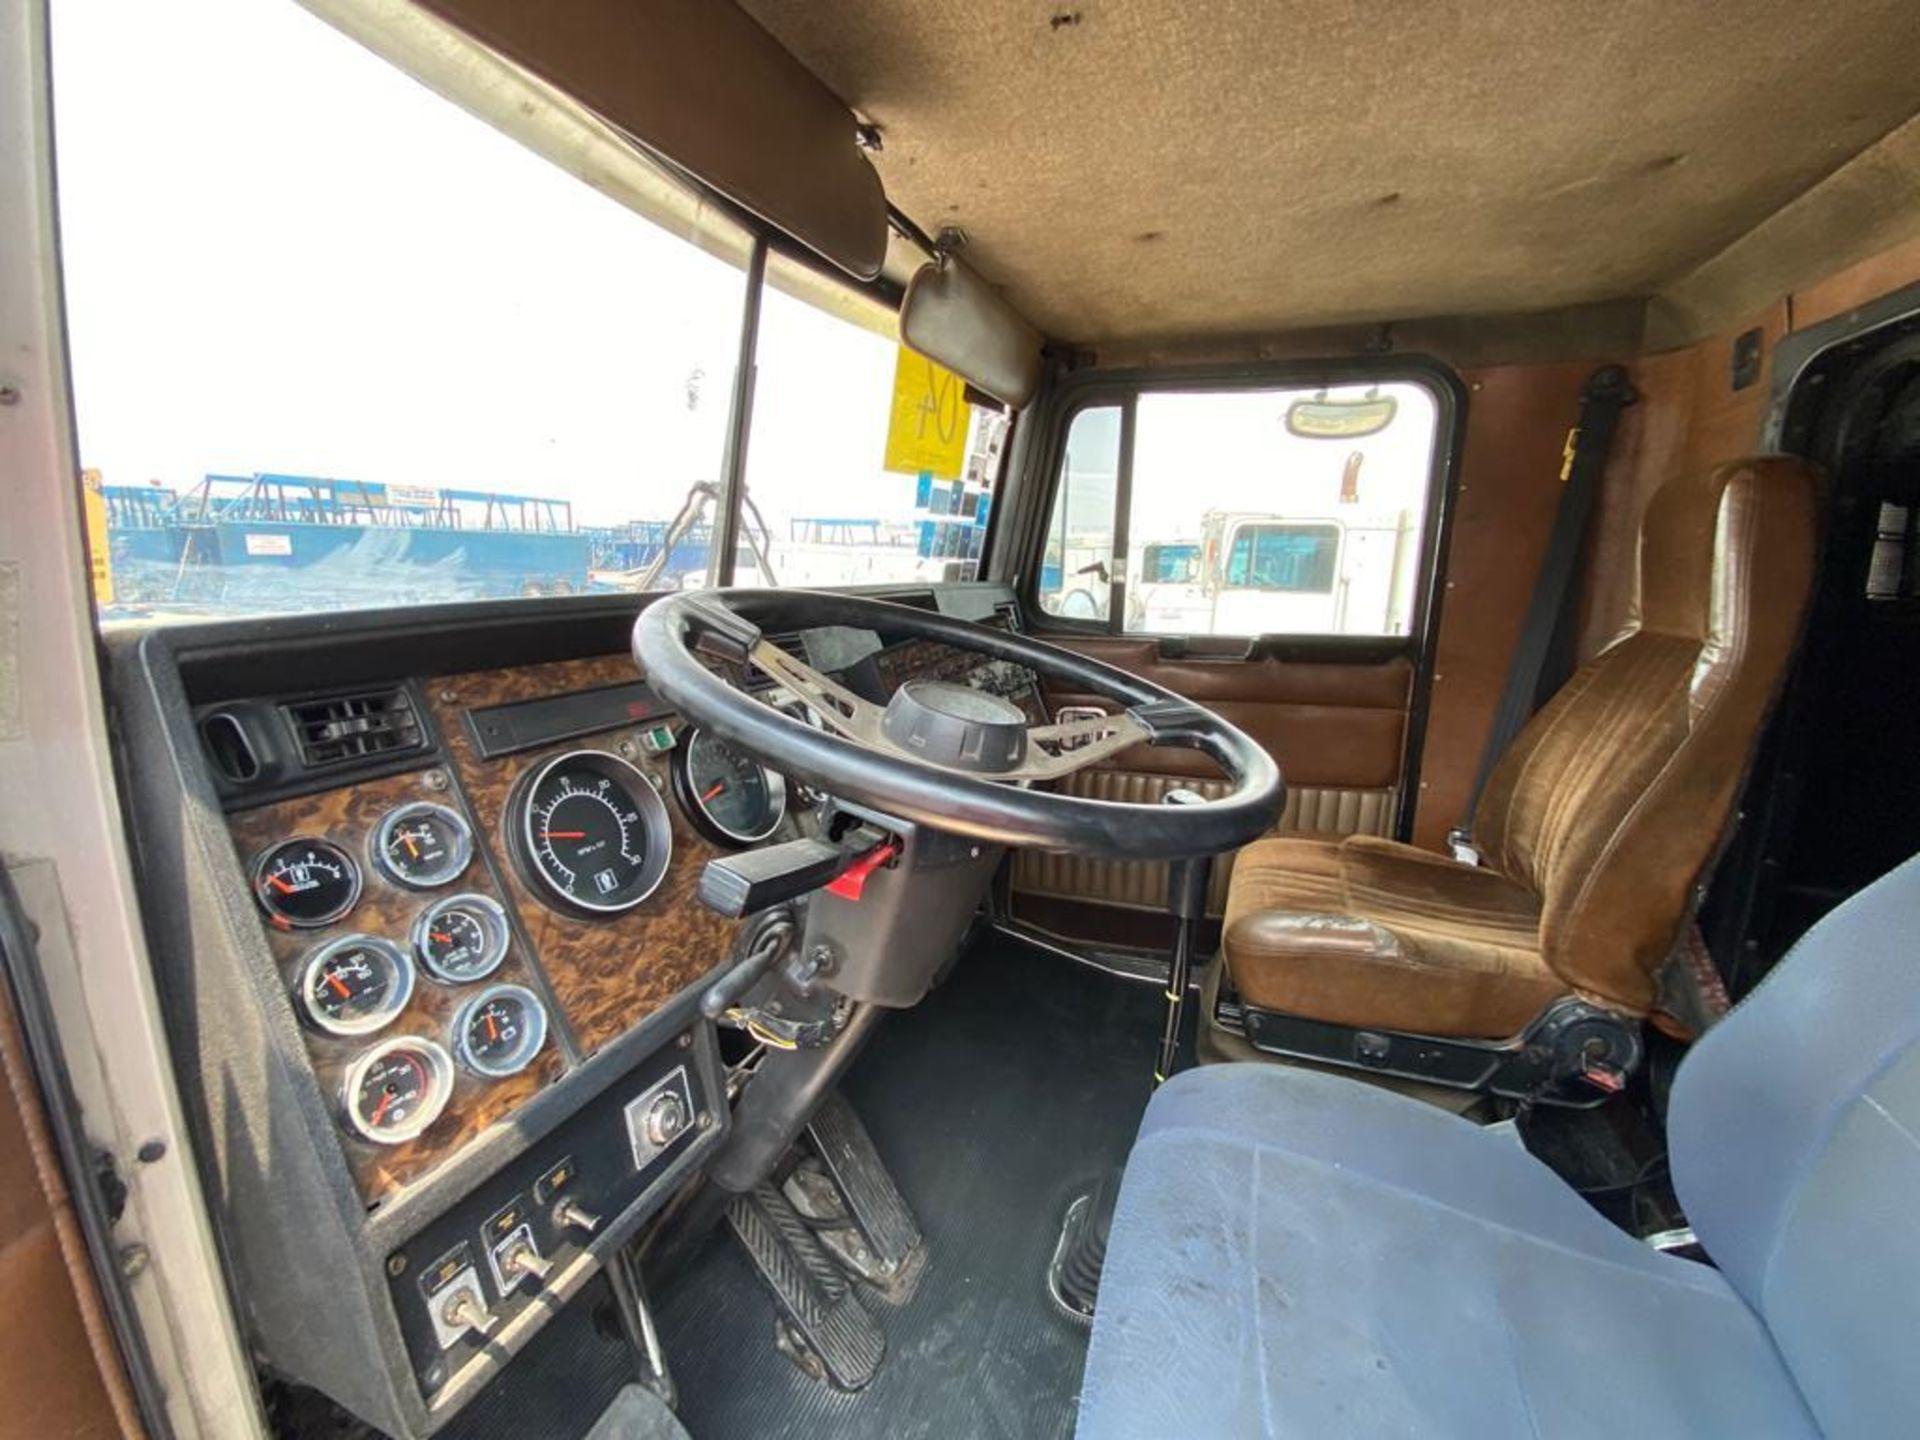 1999 Kenworth Sleeper truck tractor, standard transmission of 18 speeds - Image 44 of 70